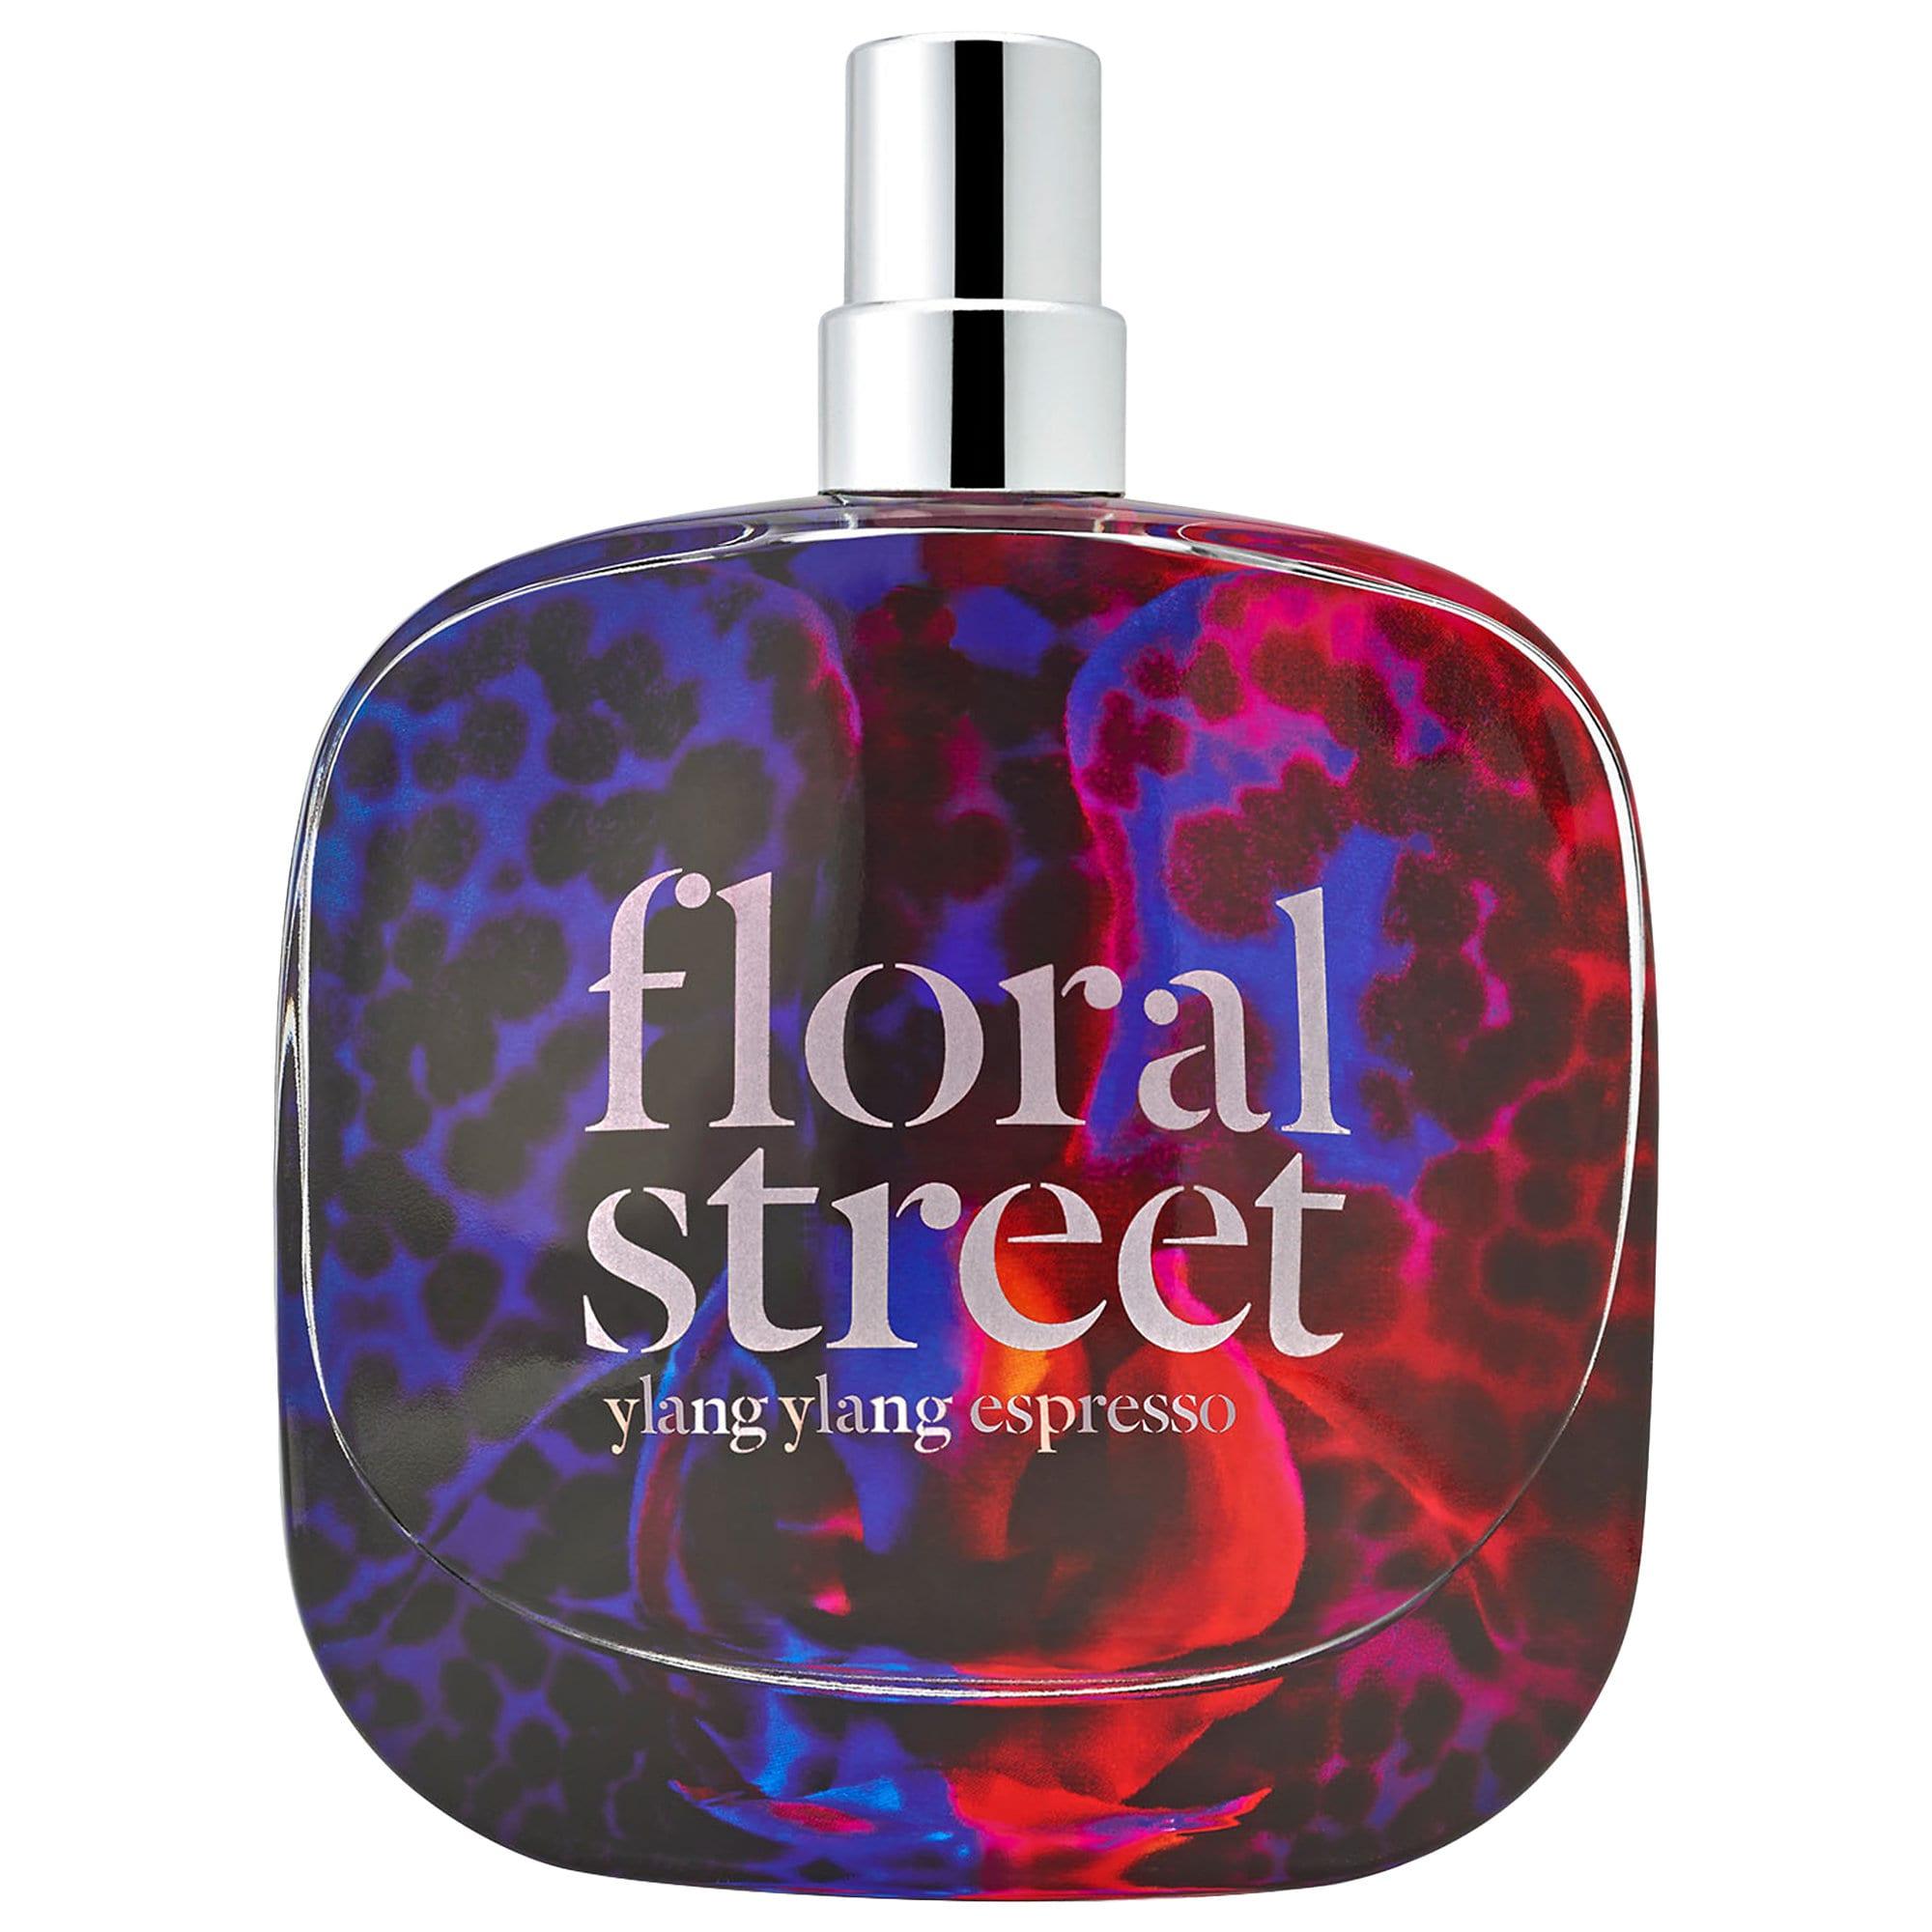 Floral Street